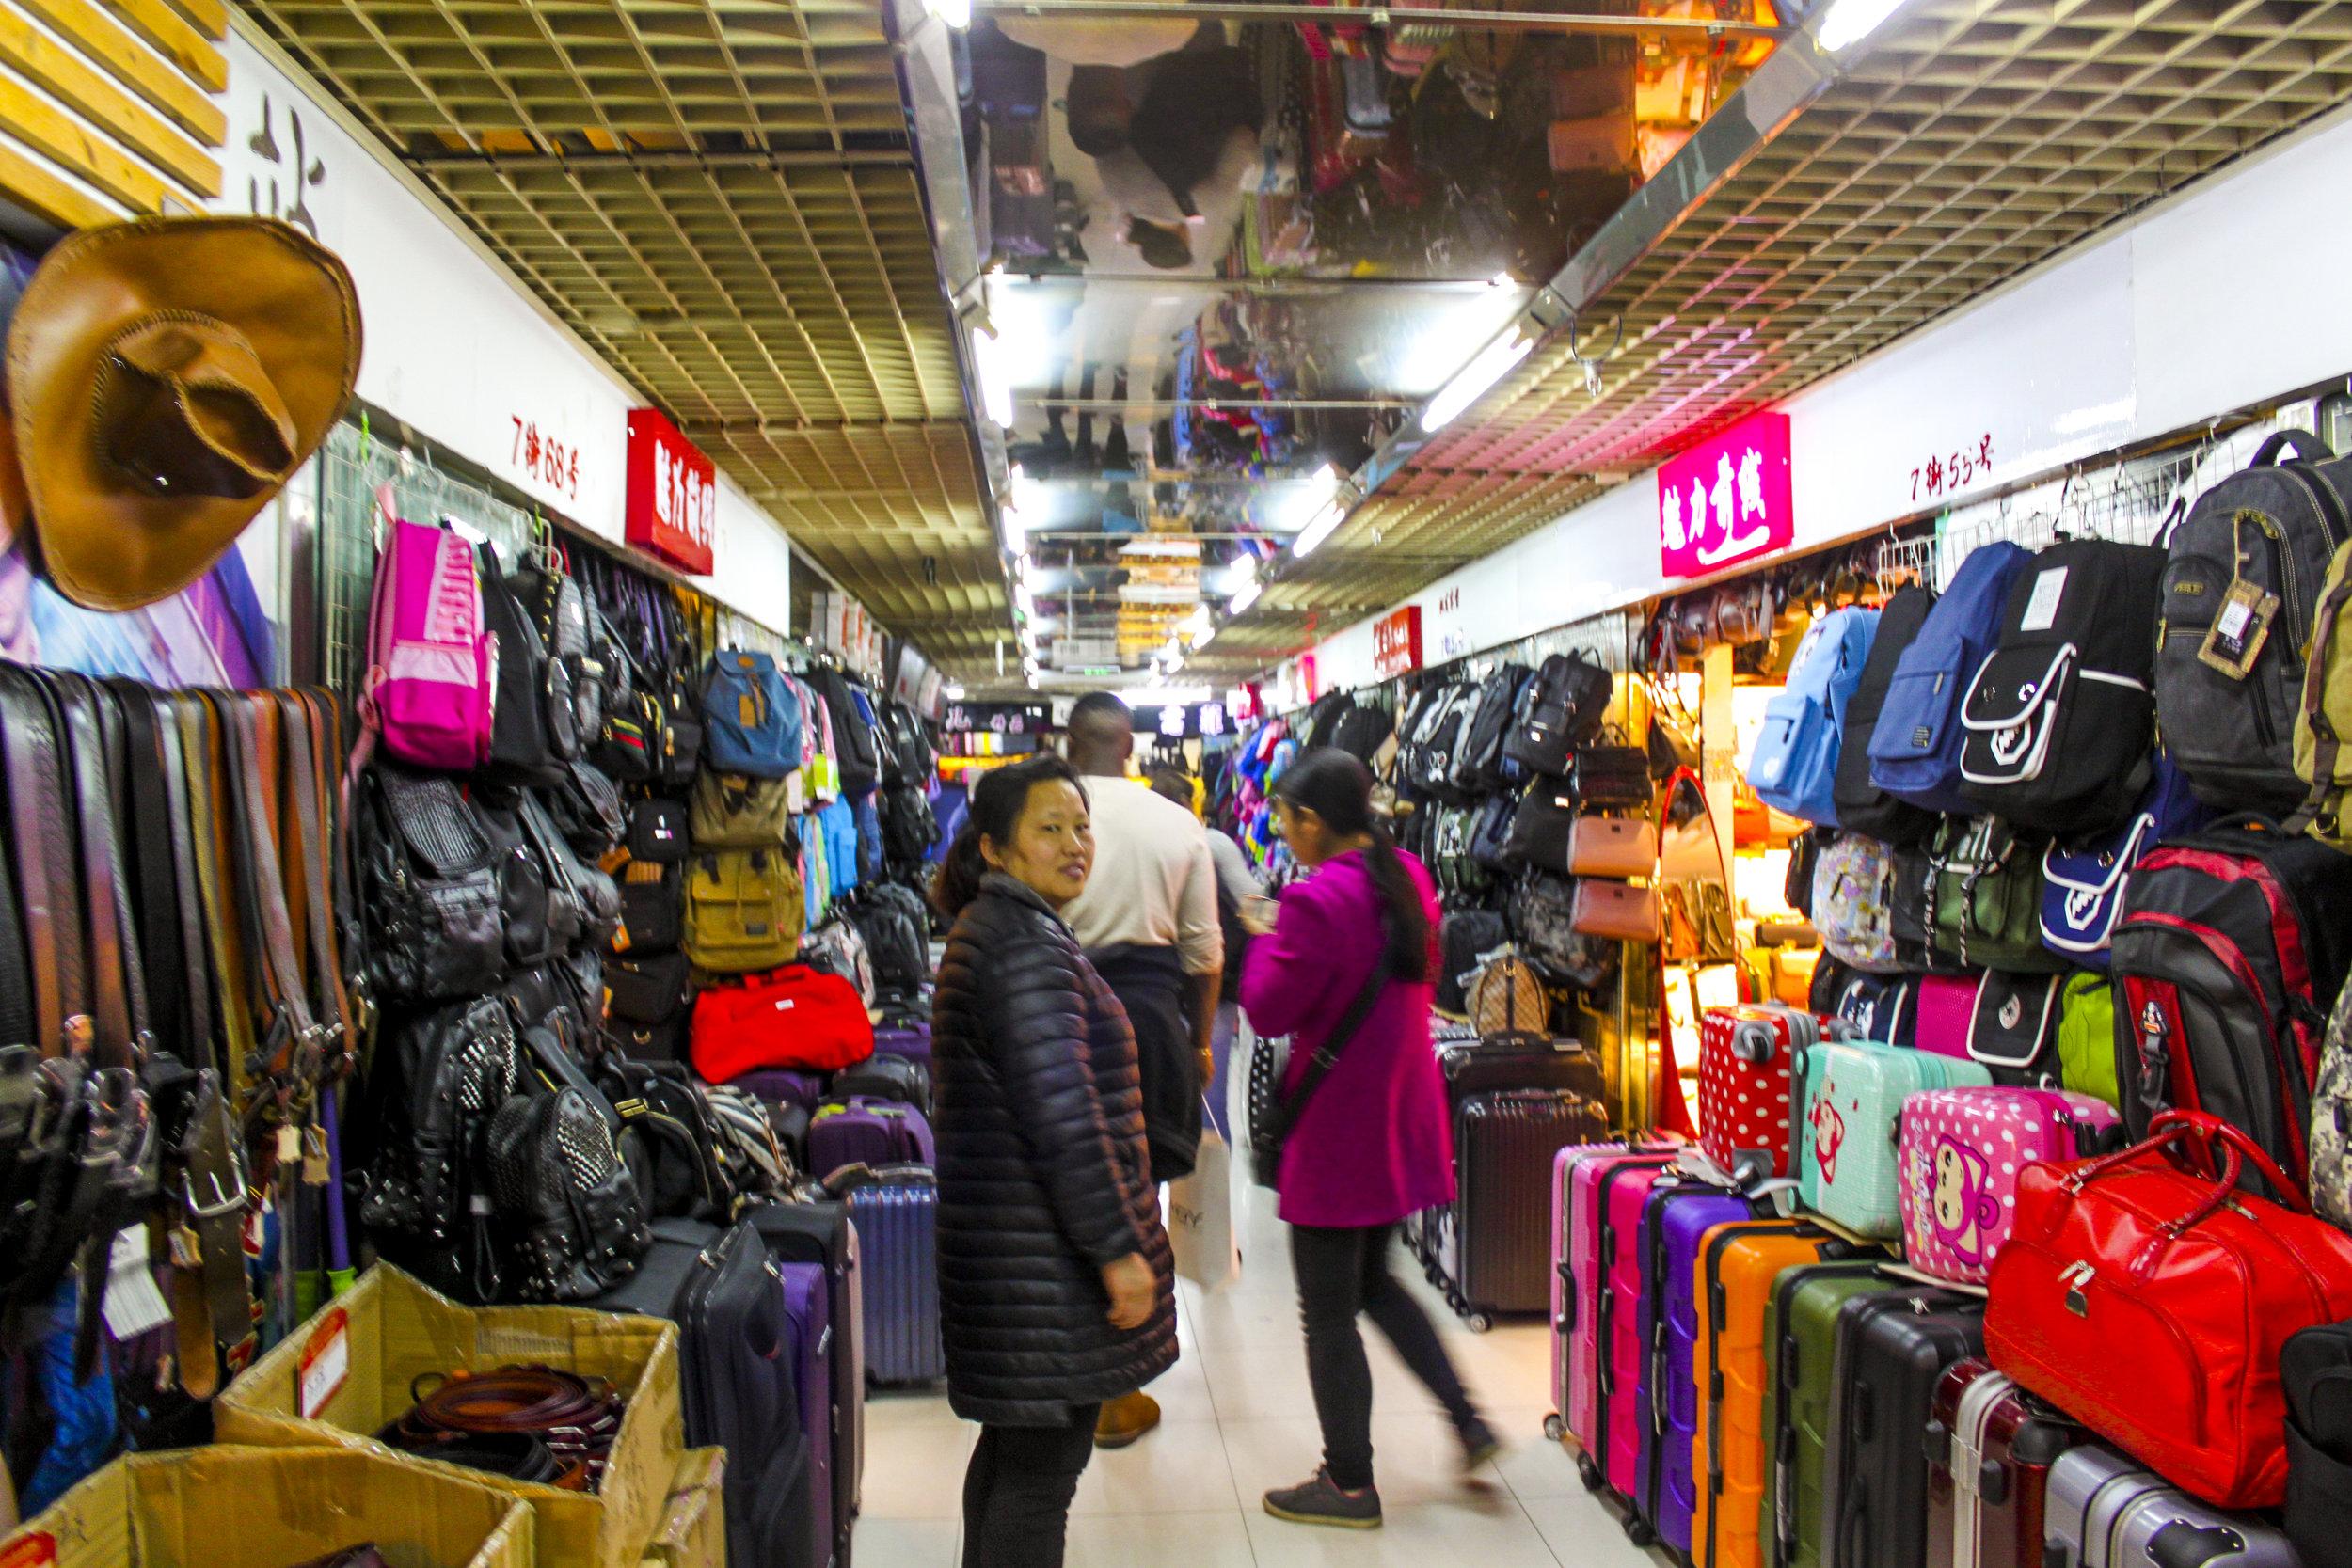 tailor-made-shanghai-sightseeing-tour-qipulu-clothing-market